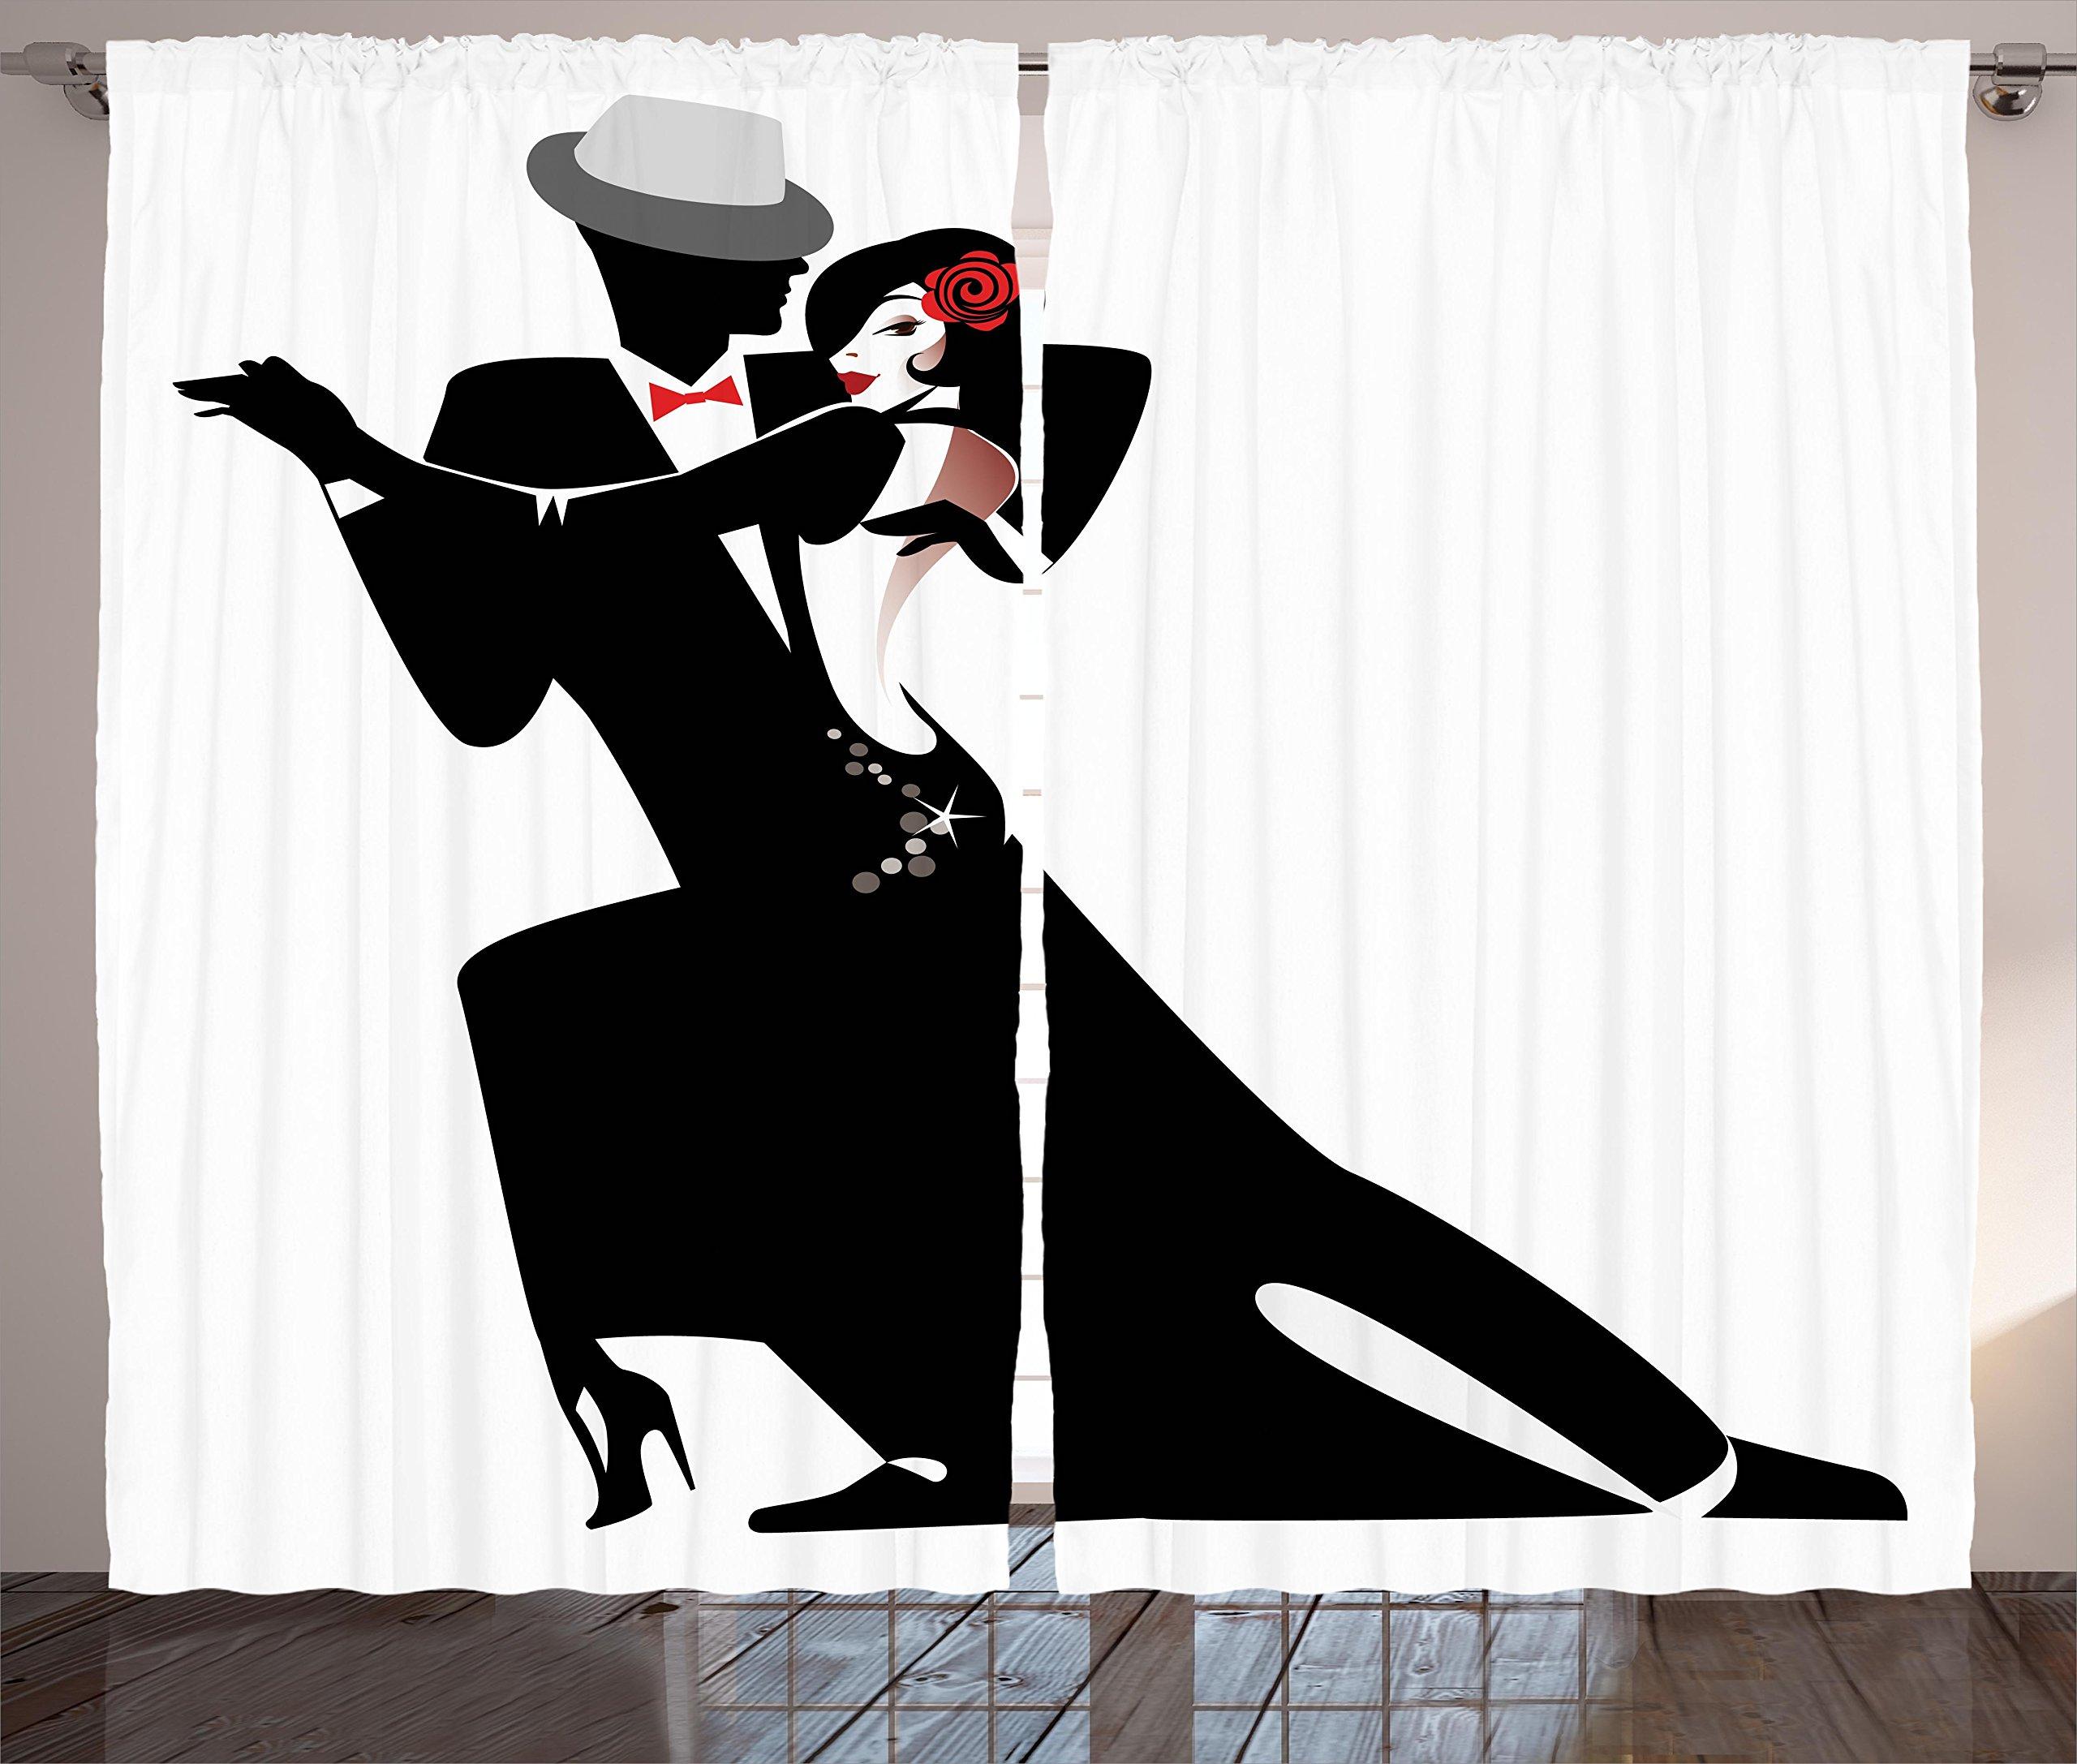 Ambesonne Girls Curtains Decor, Man and Woman Partners Romantic Dance Tango Waltz Love Valentine's Rhythm Music Art, Living Room Bedroom Window Drapes 2 Panel Set, 108 W X 84 L inches, Black White